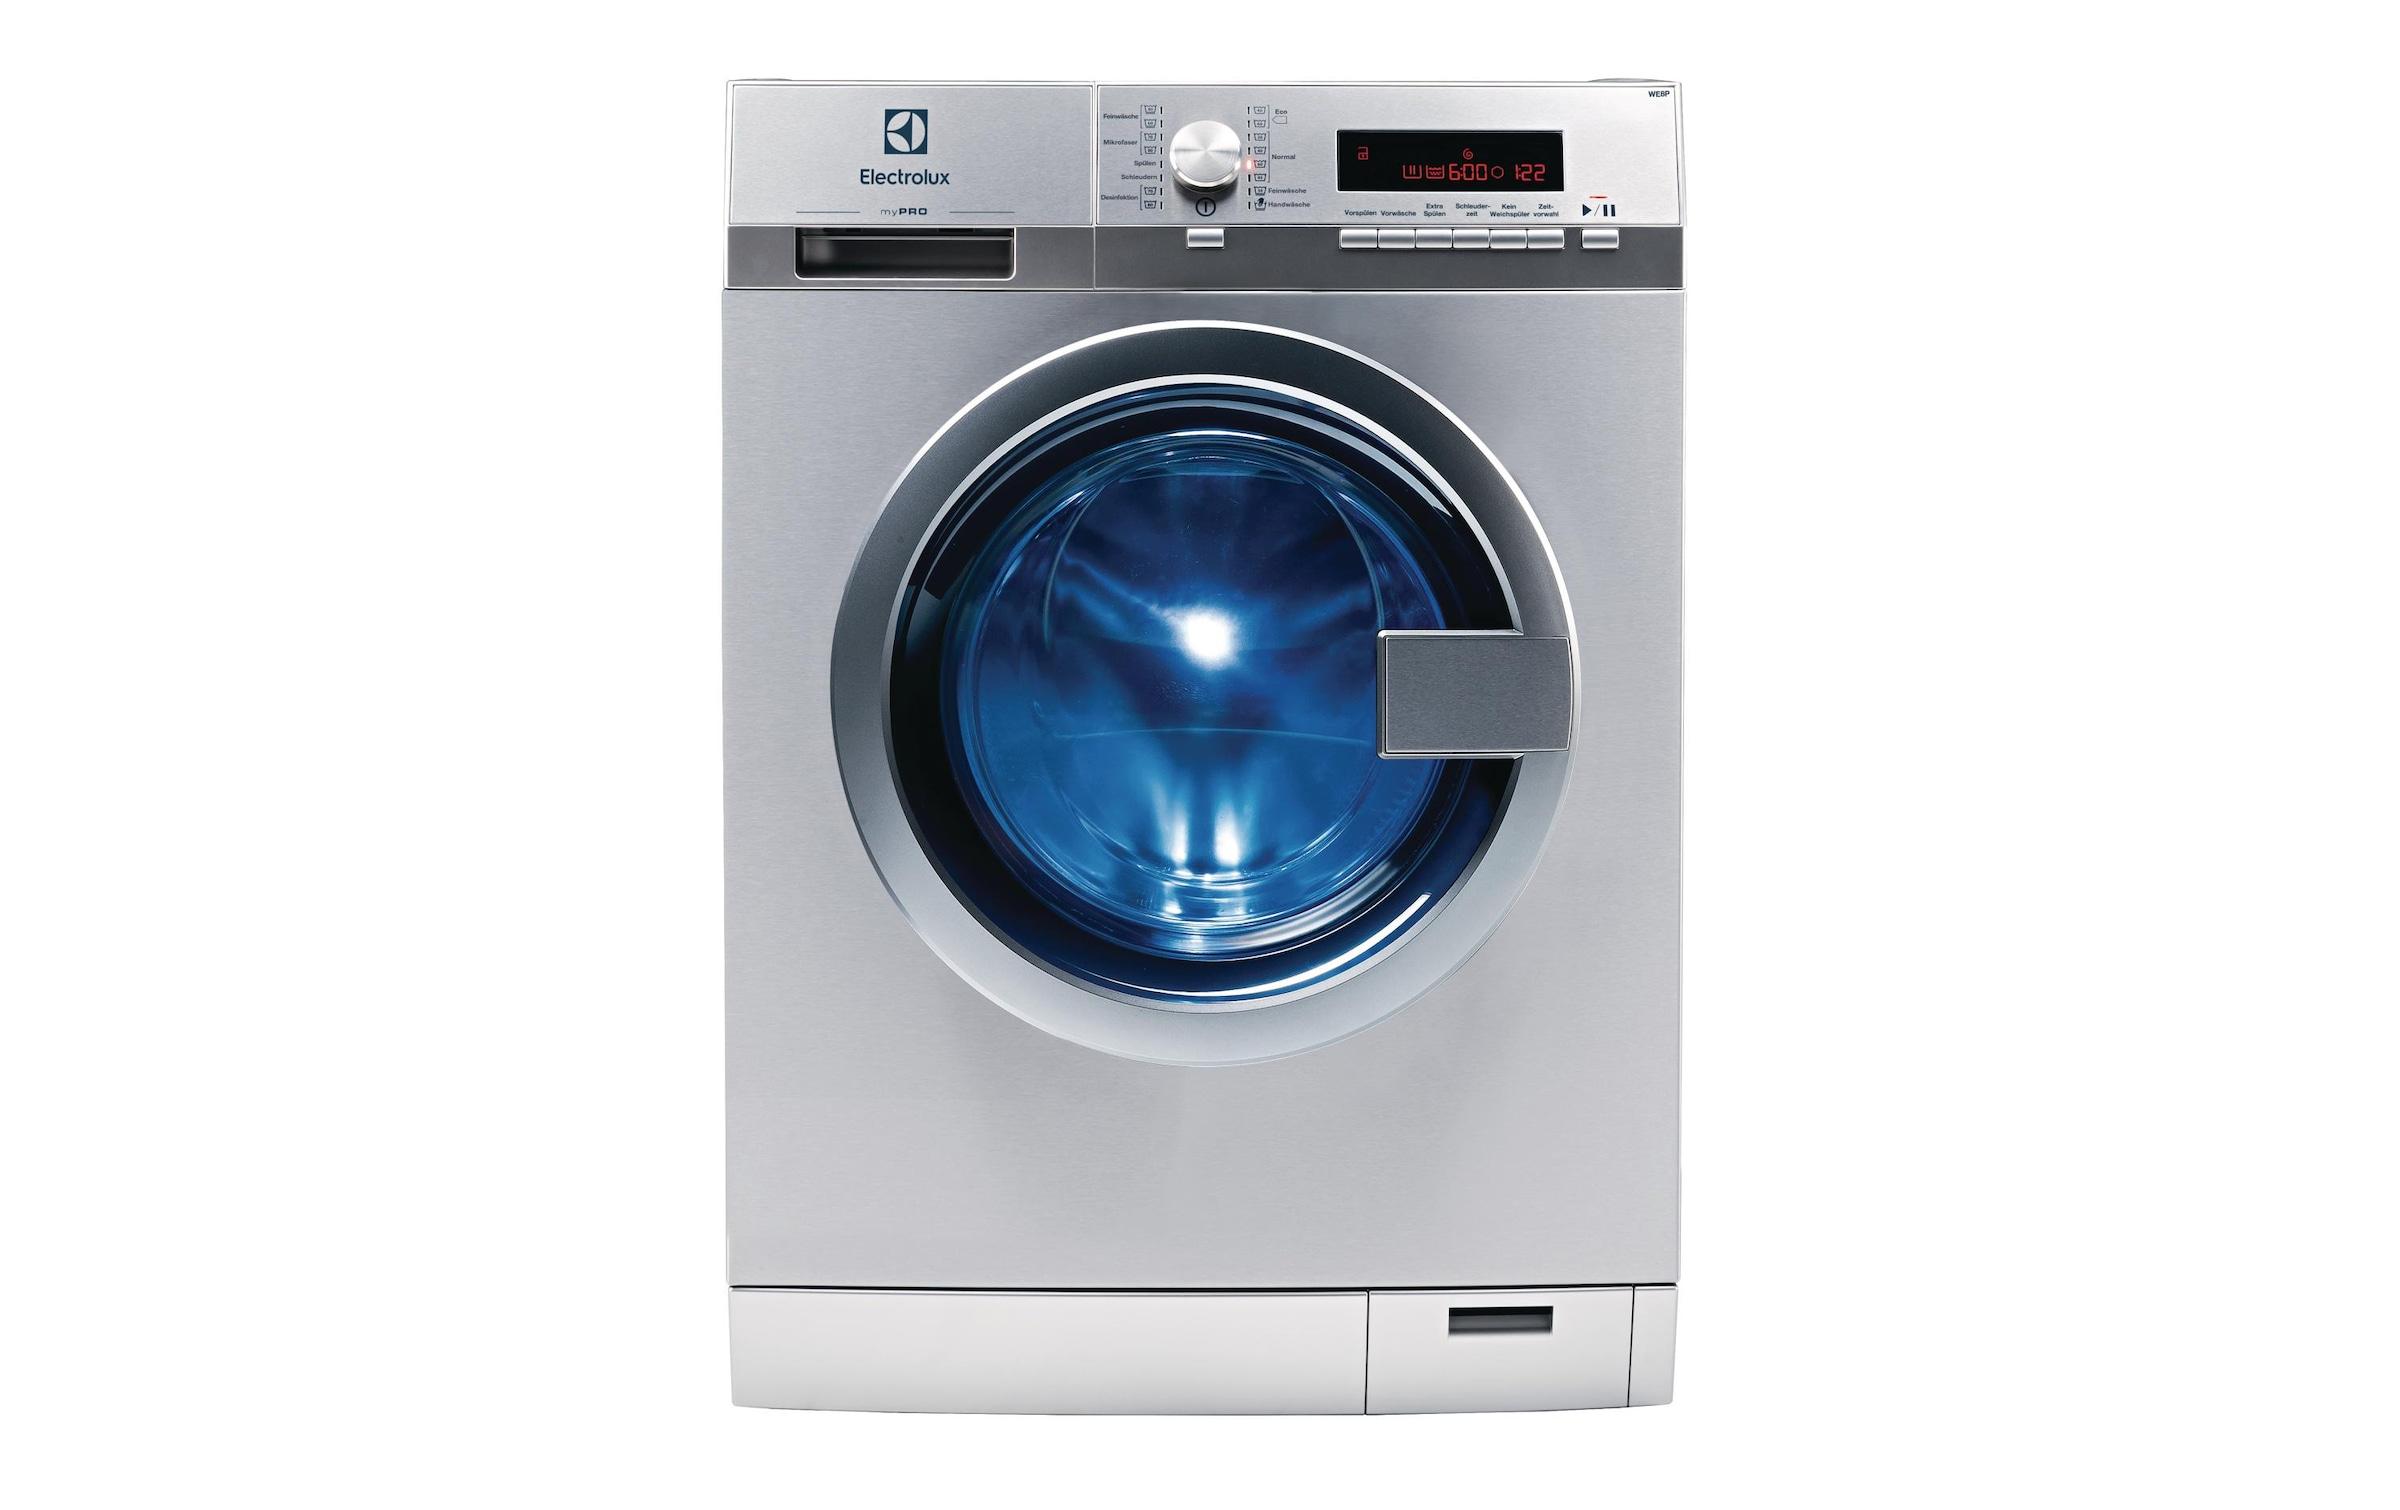 Image of AEG Electrolux Waschmaschine, WE8PCH PUMPE A+++